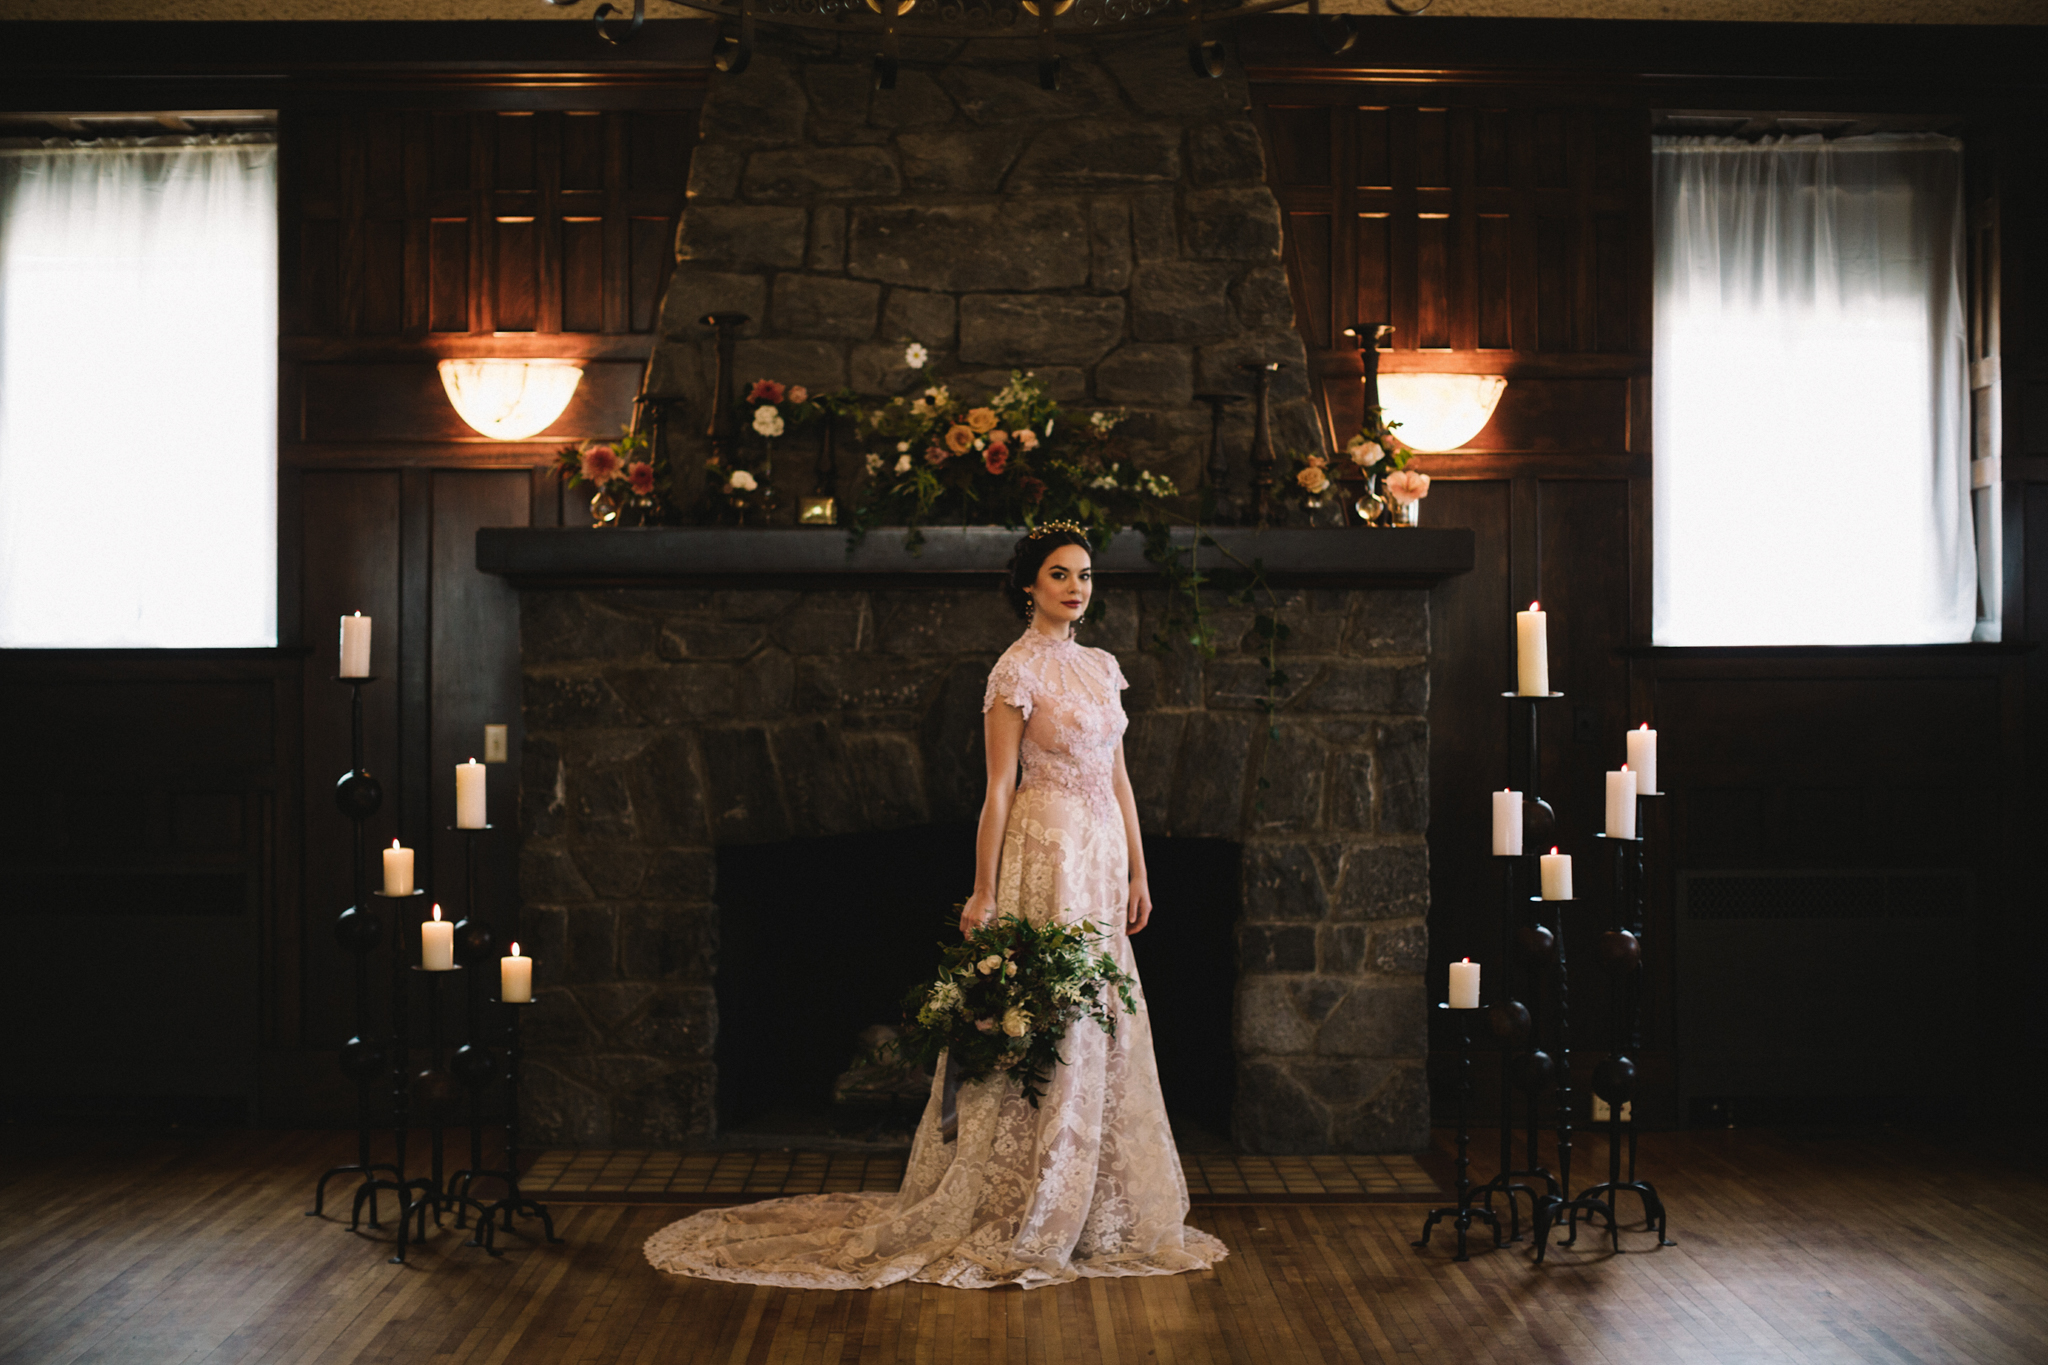 Southern gothic wedding